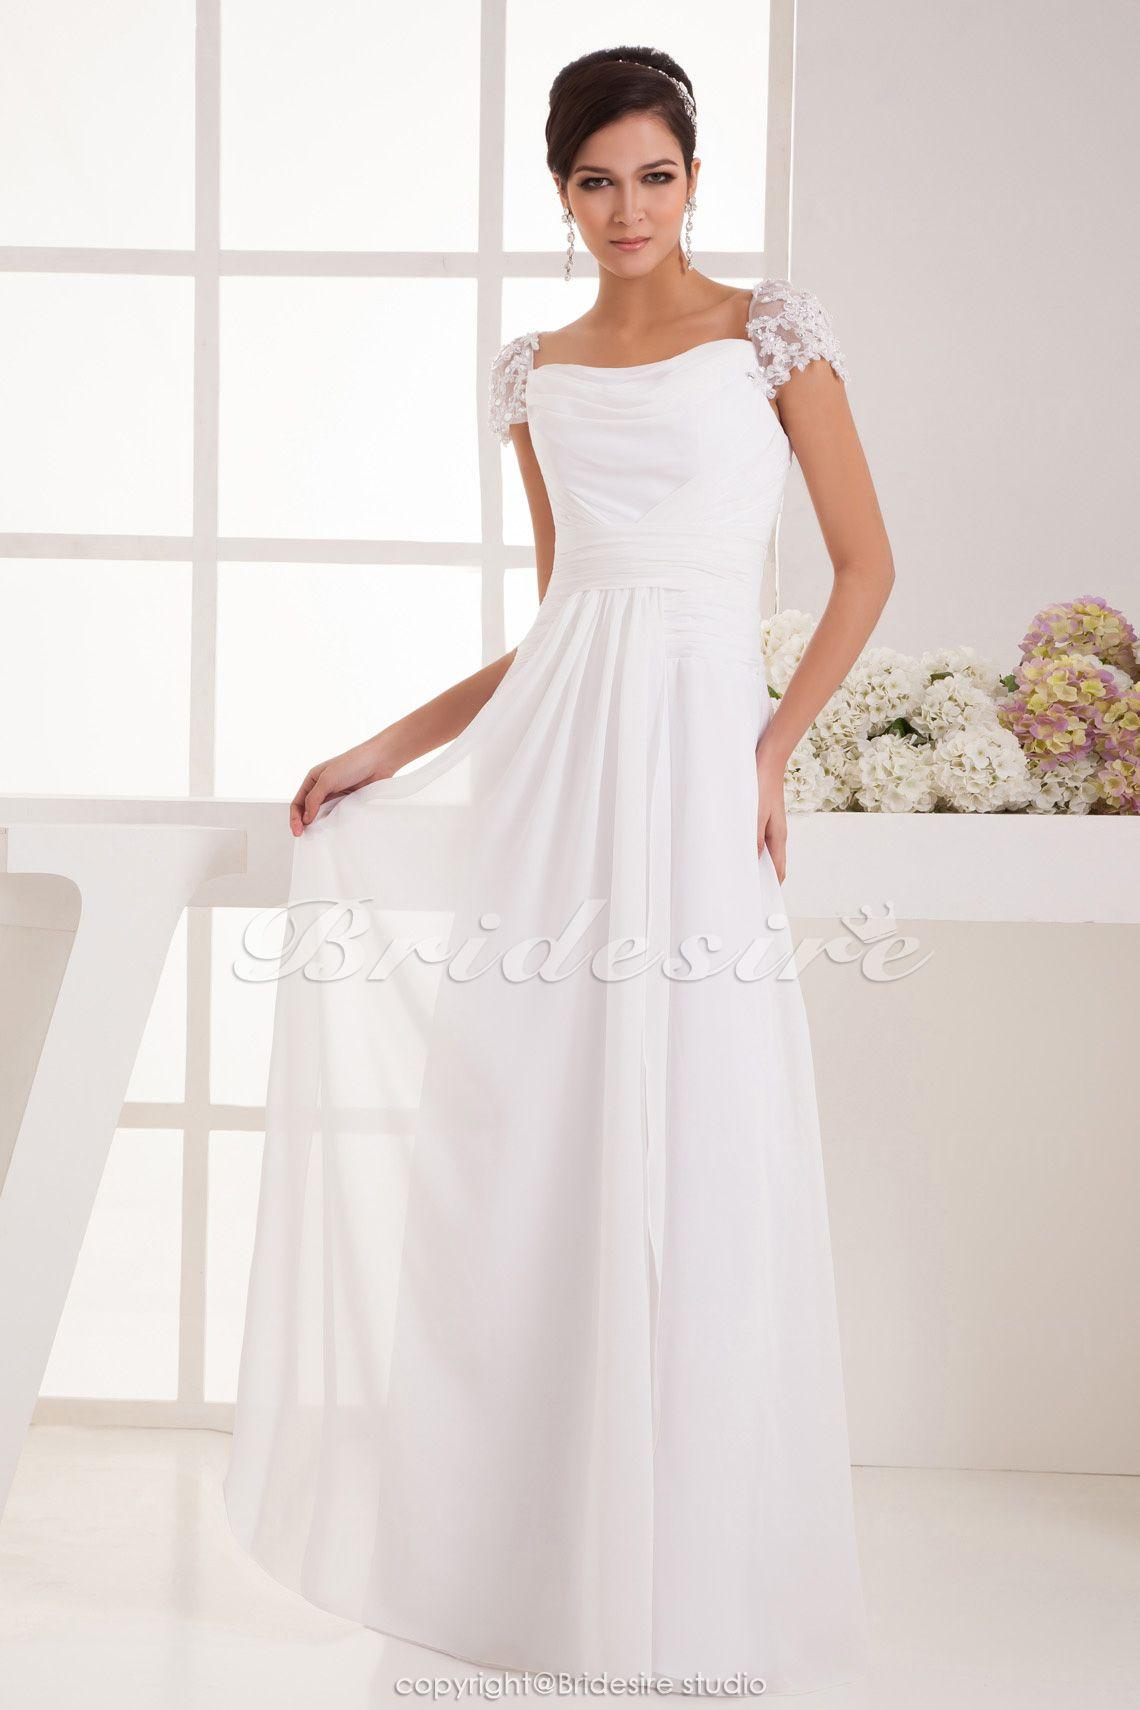 Bridesire A Line Strapless Floor Length Short Sleeve Chiffon Wedding Dress Bd41350 Us 99 99 Bridesire Floor Length Wedding Dress Online Wedding Dress Column Wedding Dress [ 1710 x 1140 Pixel ]